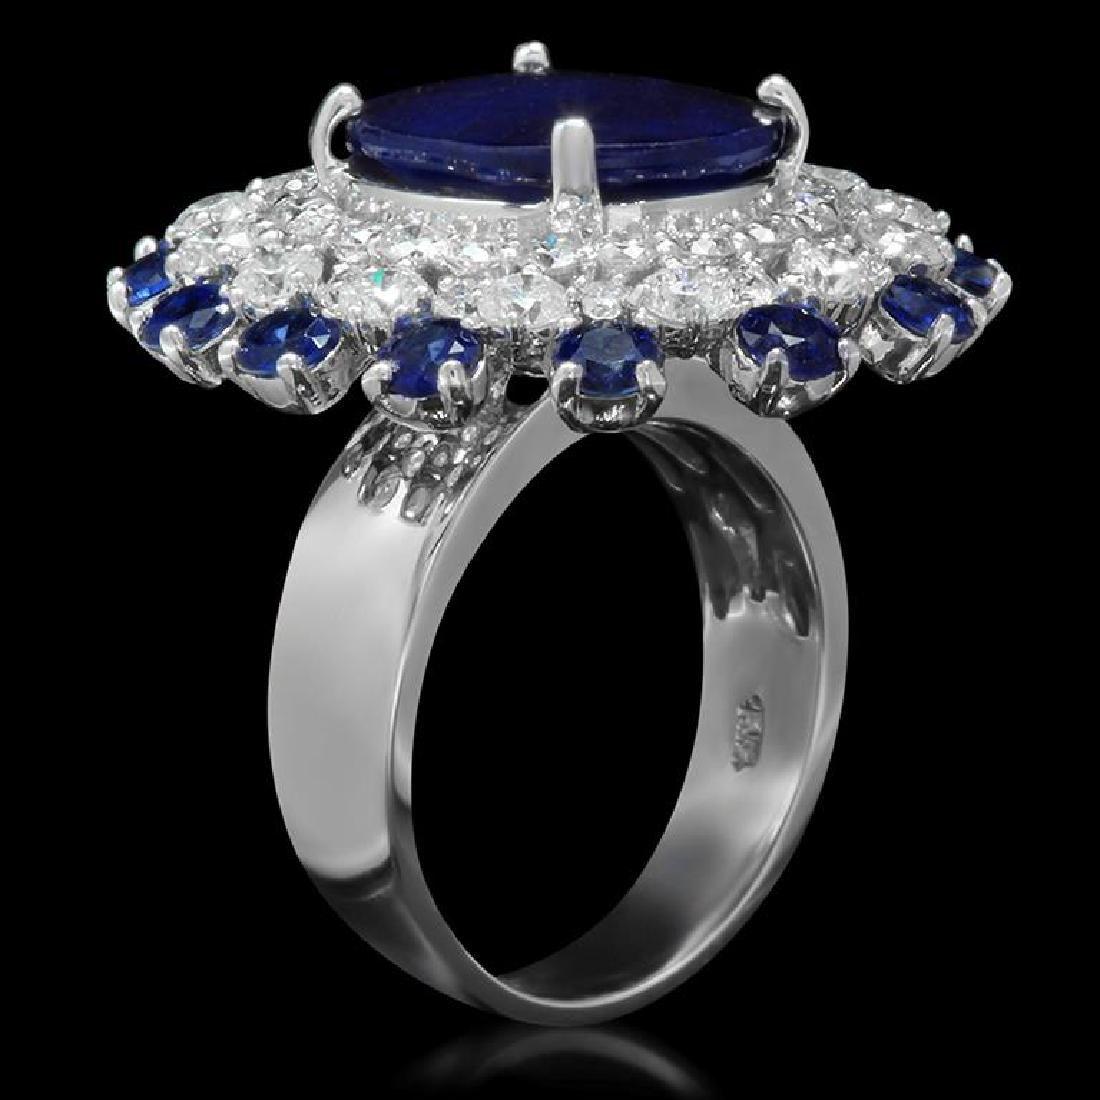 14K Gold 9.97ct Sapphire 2.31ct Diamond Ring - 2